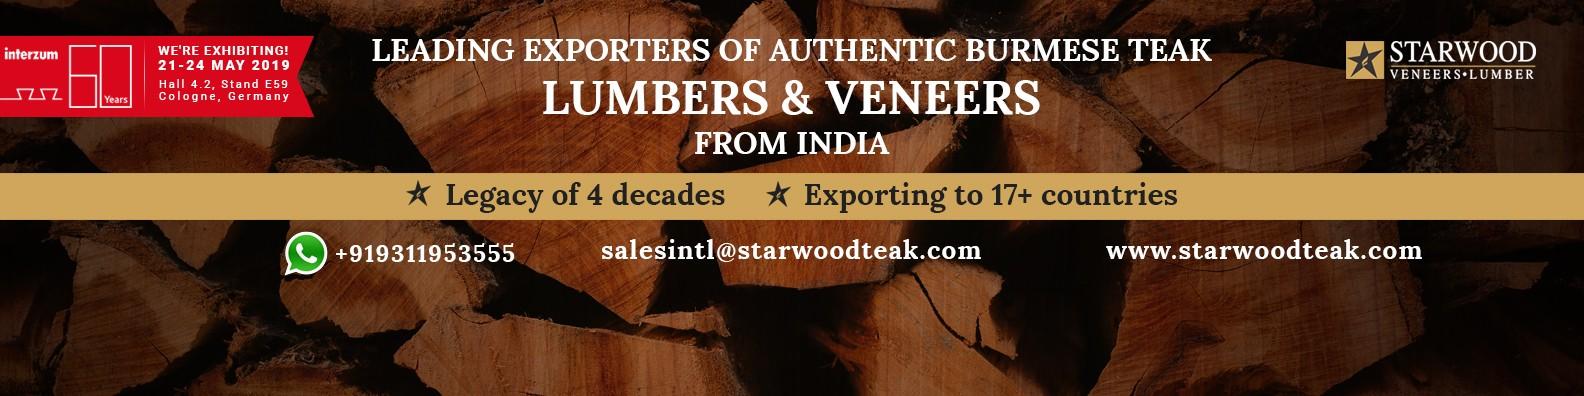 Starwood Veneers Pvt Ltd Linkedin